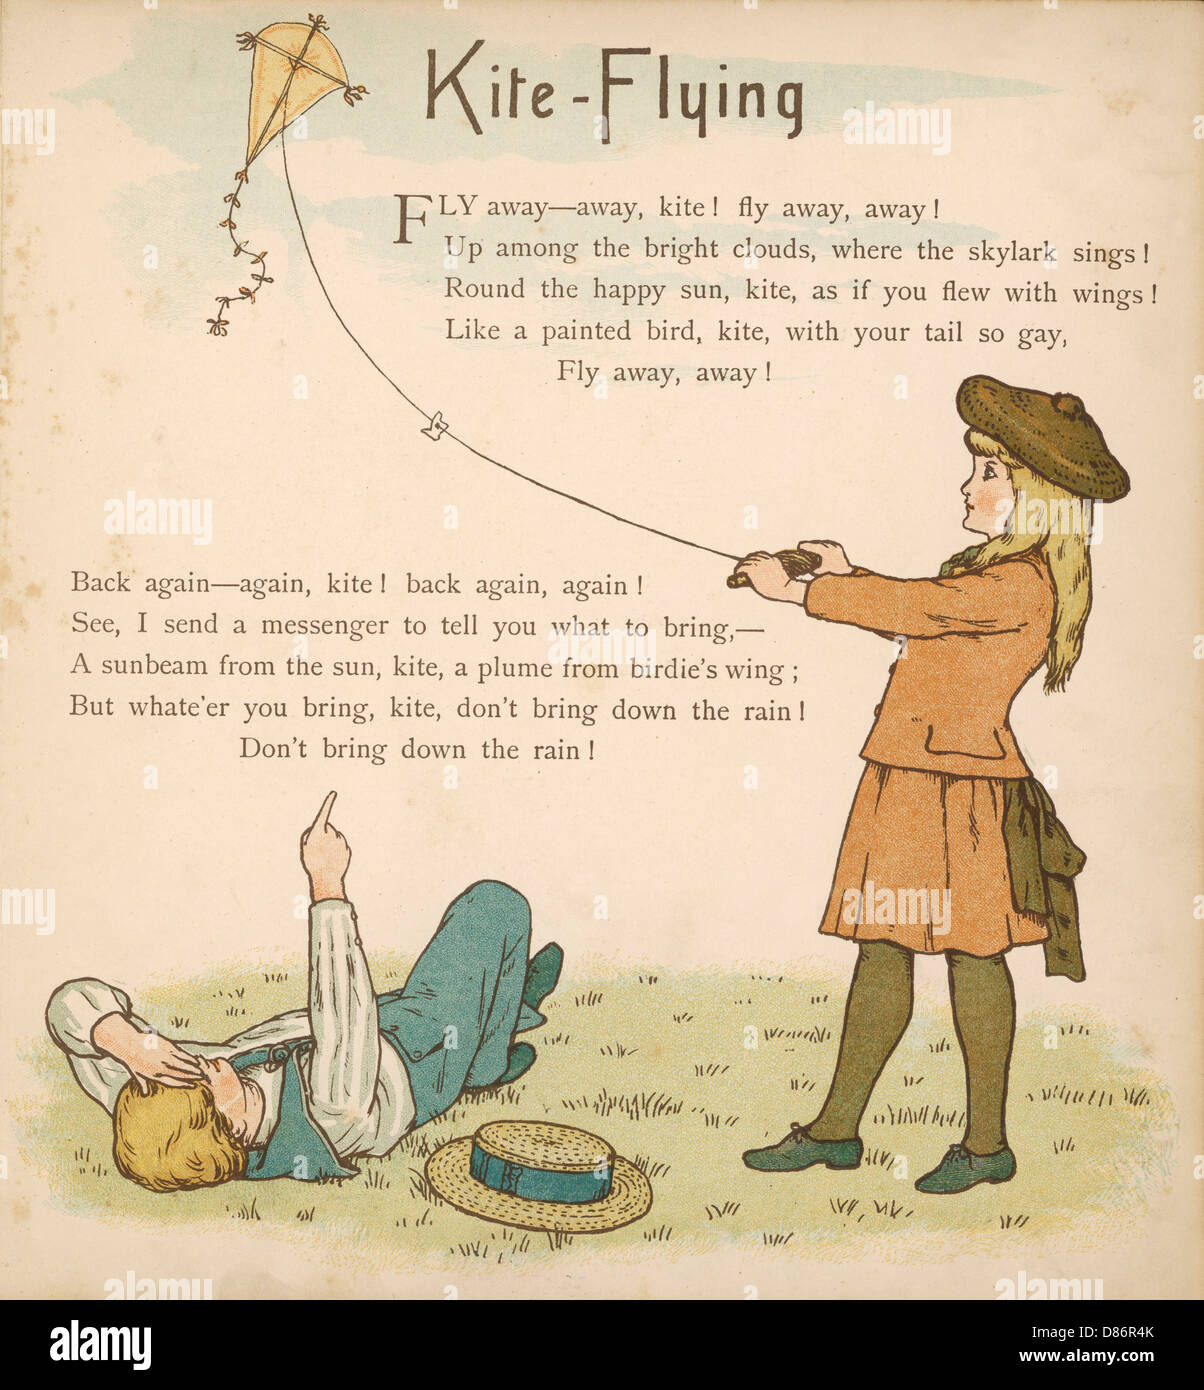 1886 Kite Flying - Stock Image